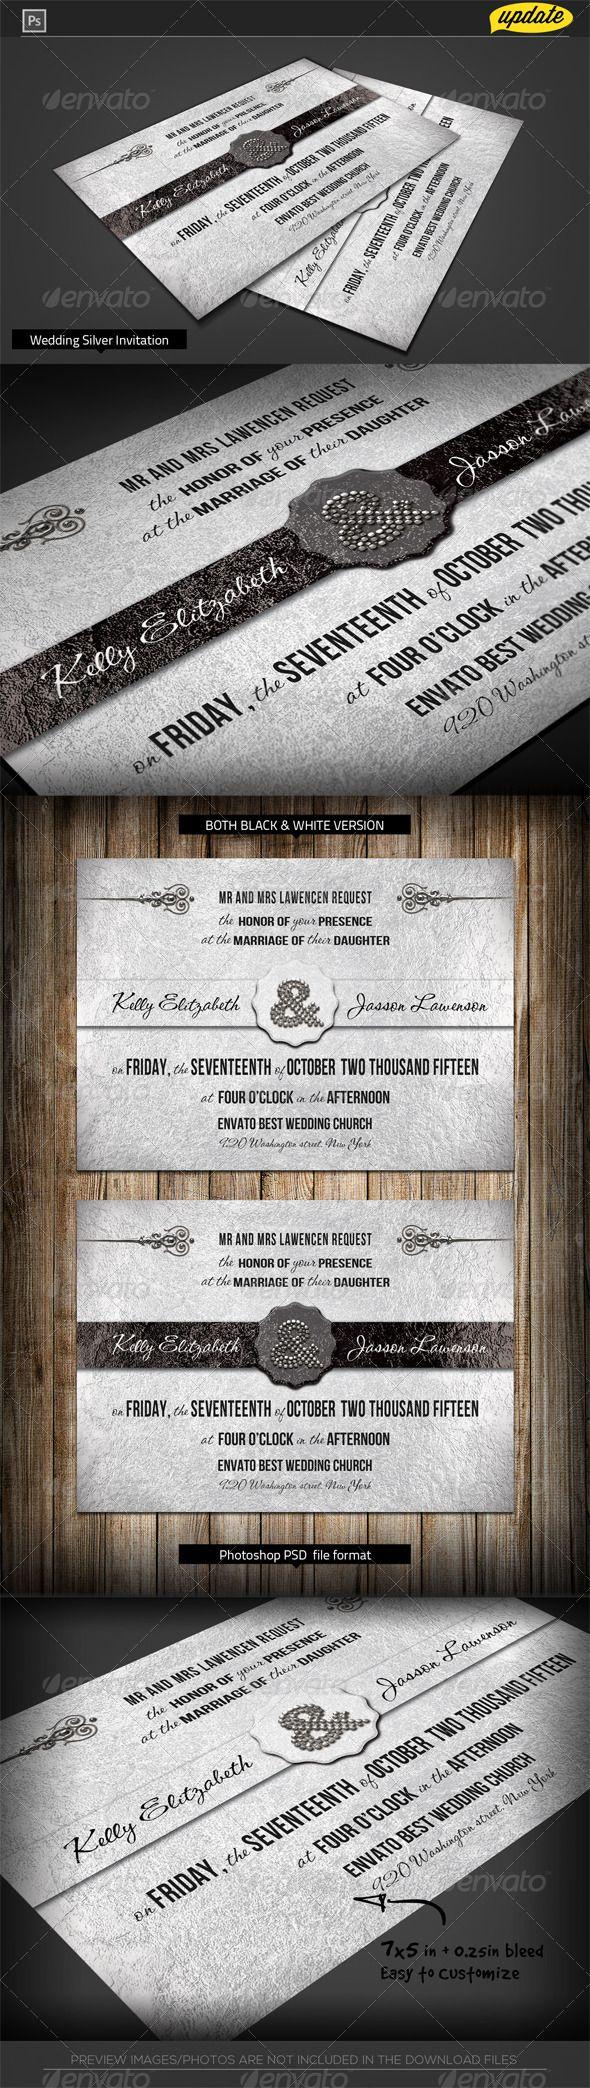 Silver Wedding Invitation Template 214 best Invites